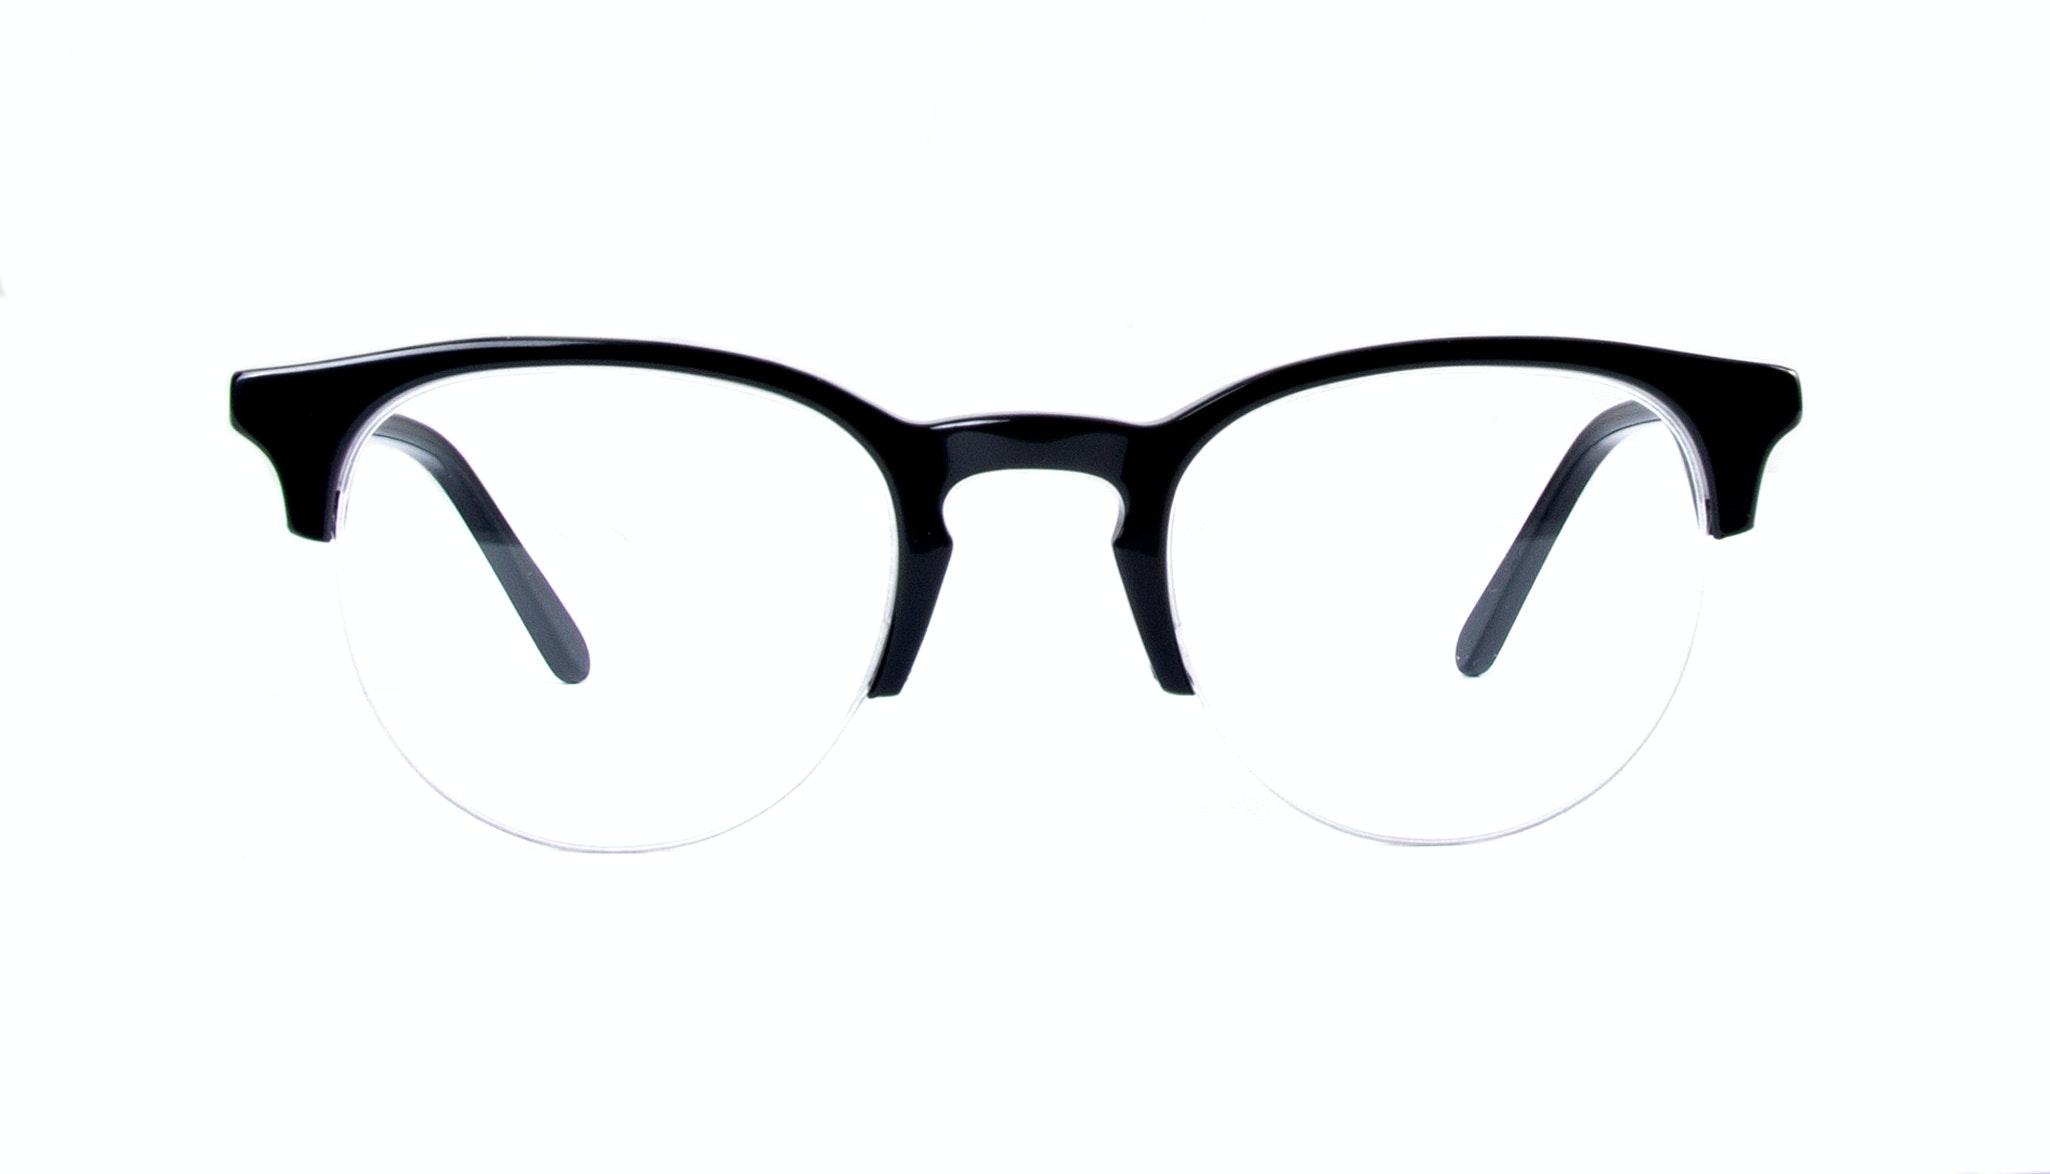 Affordable Fashion Glasses Round Semi-Rimless Eyeglasses Women Cult Light Onyx